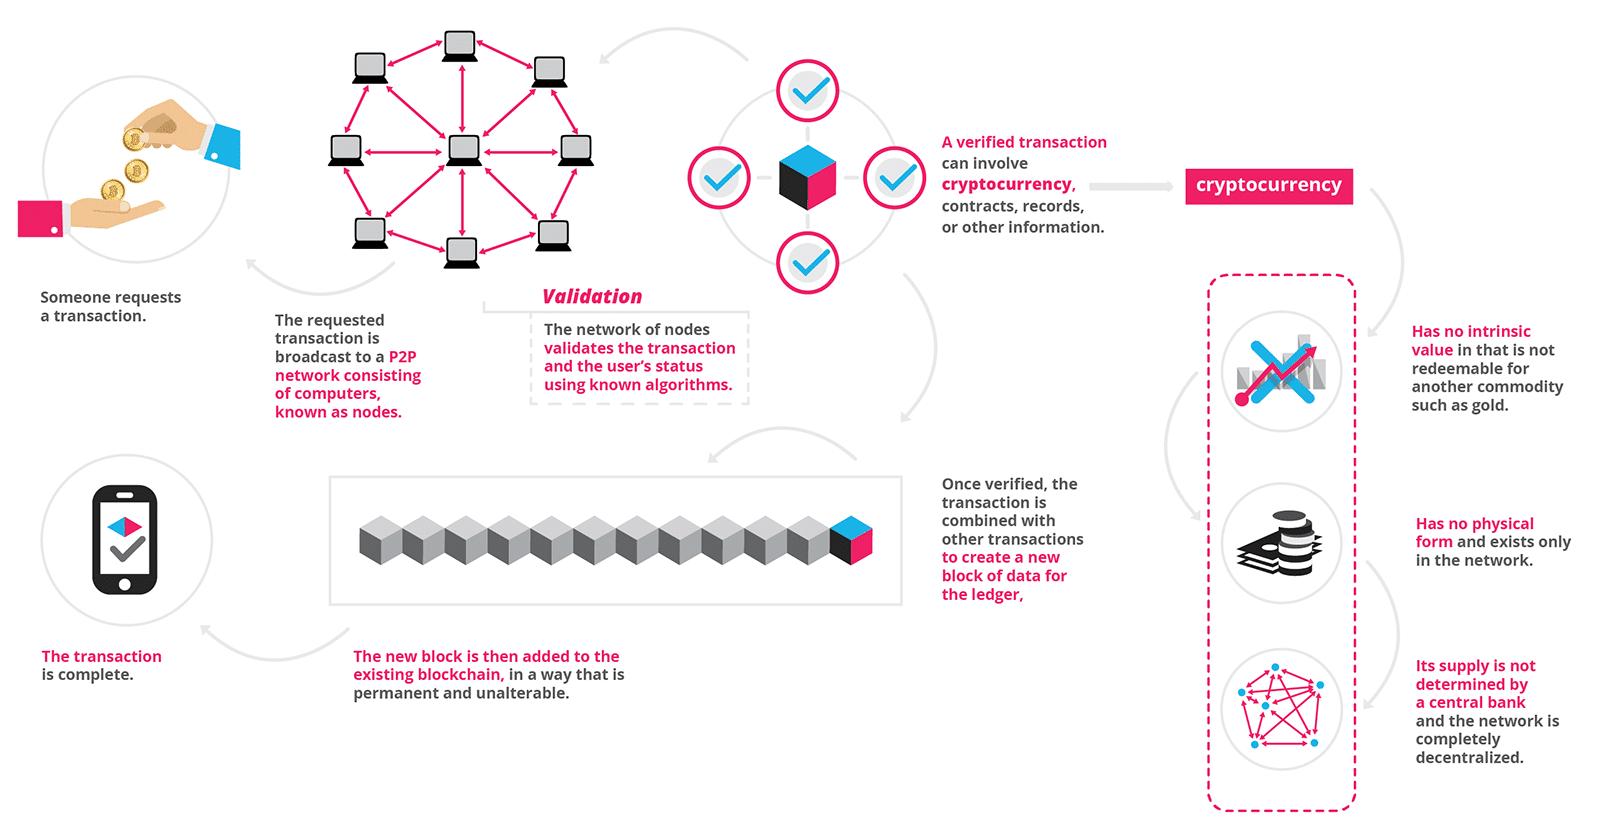 ce inseamna blockchain